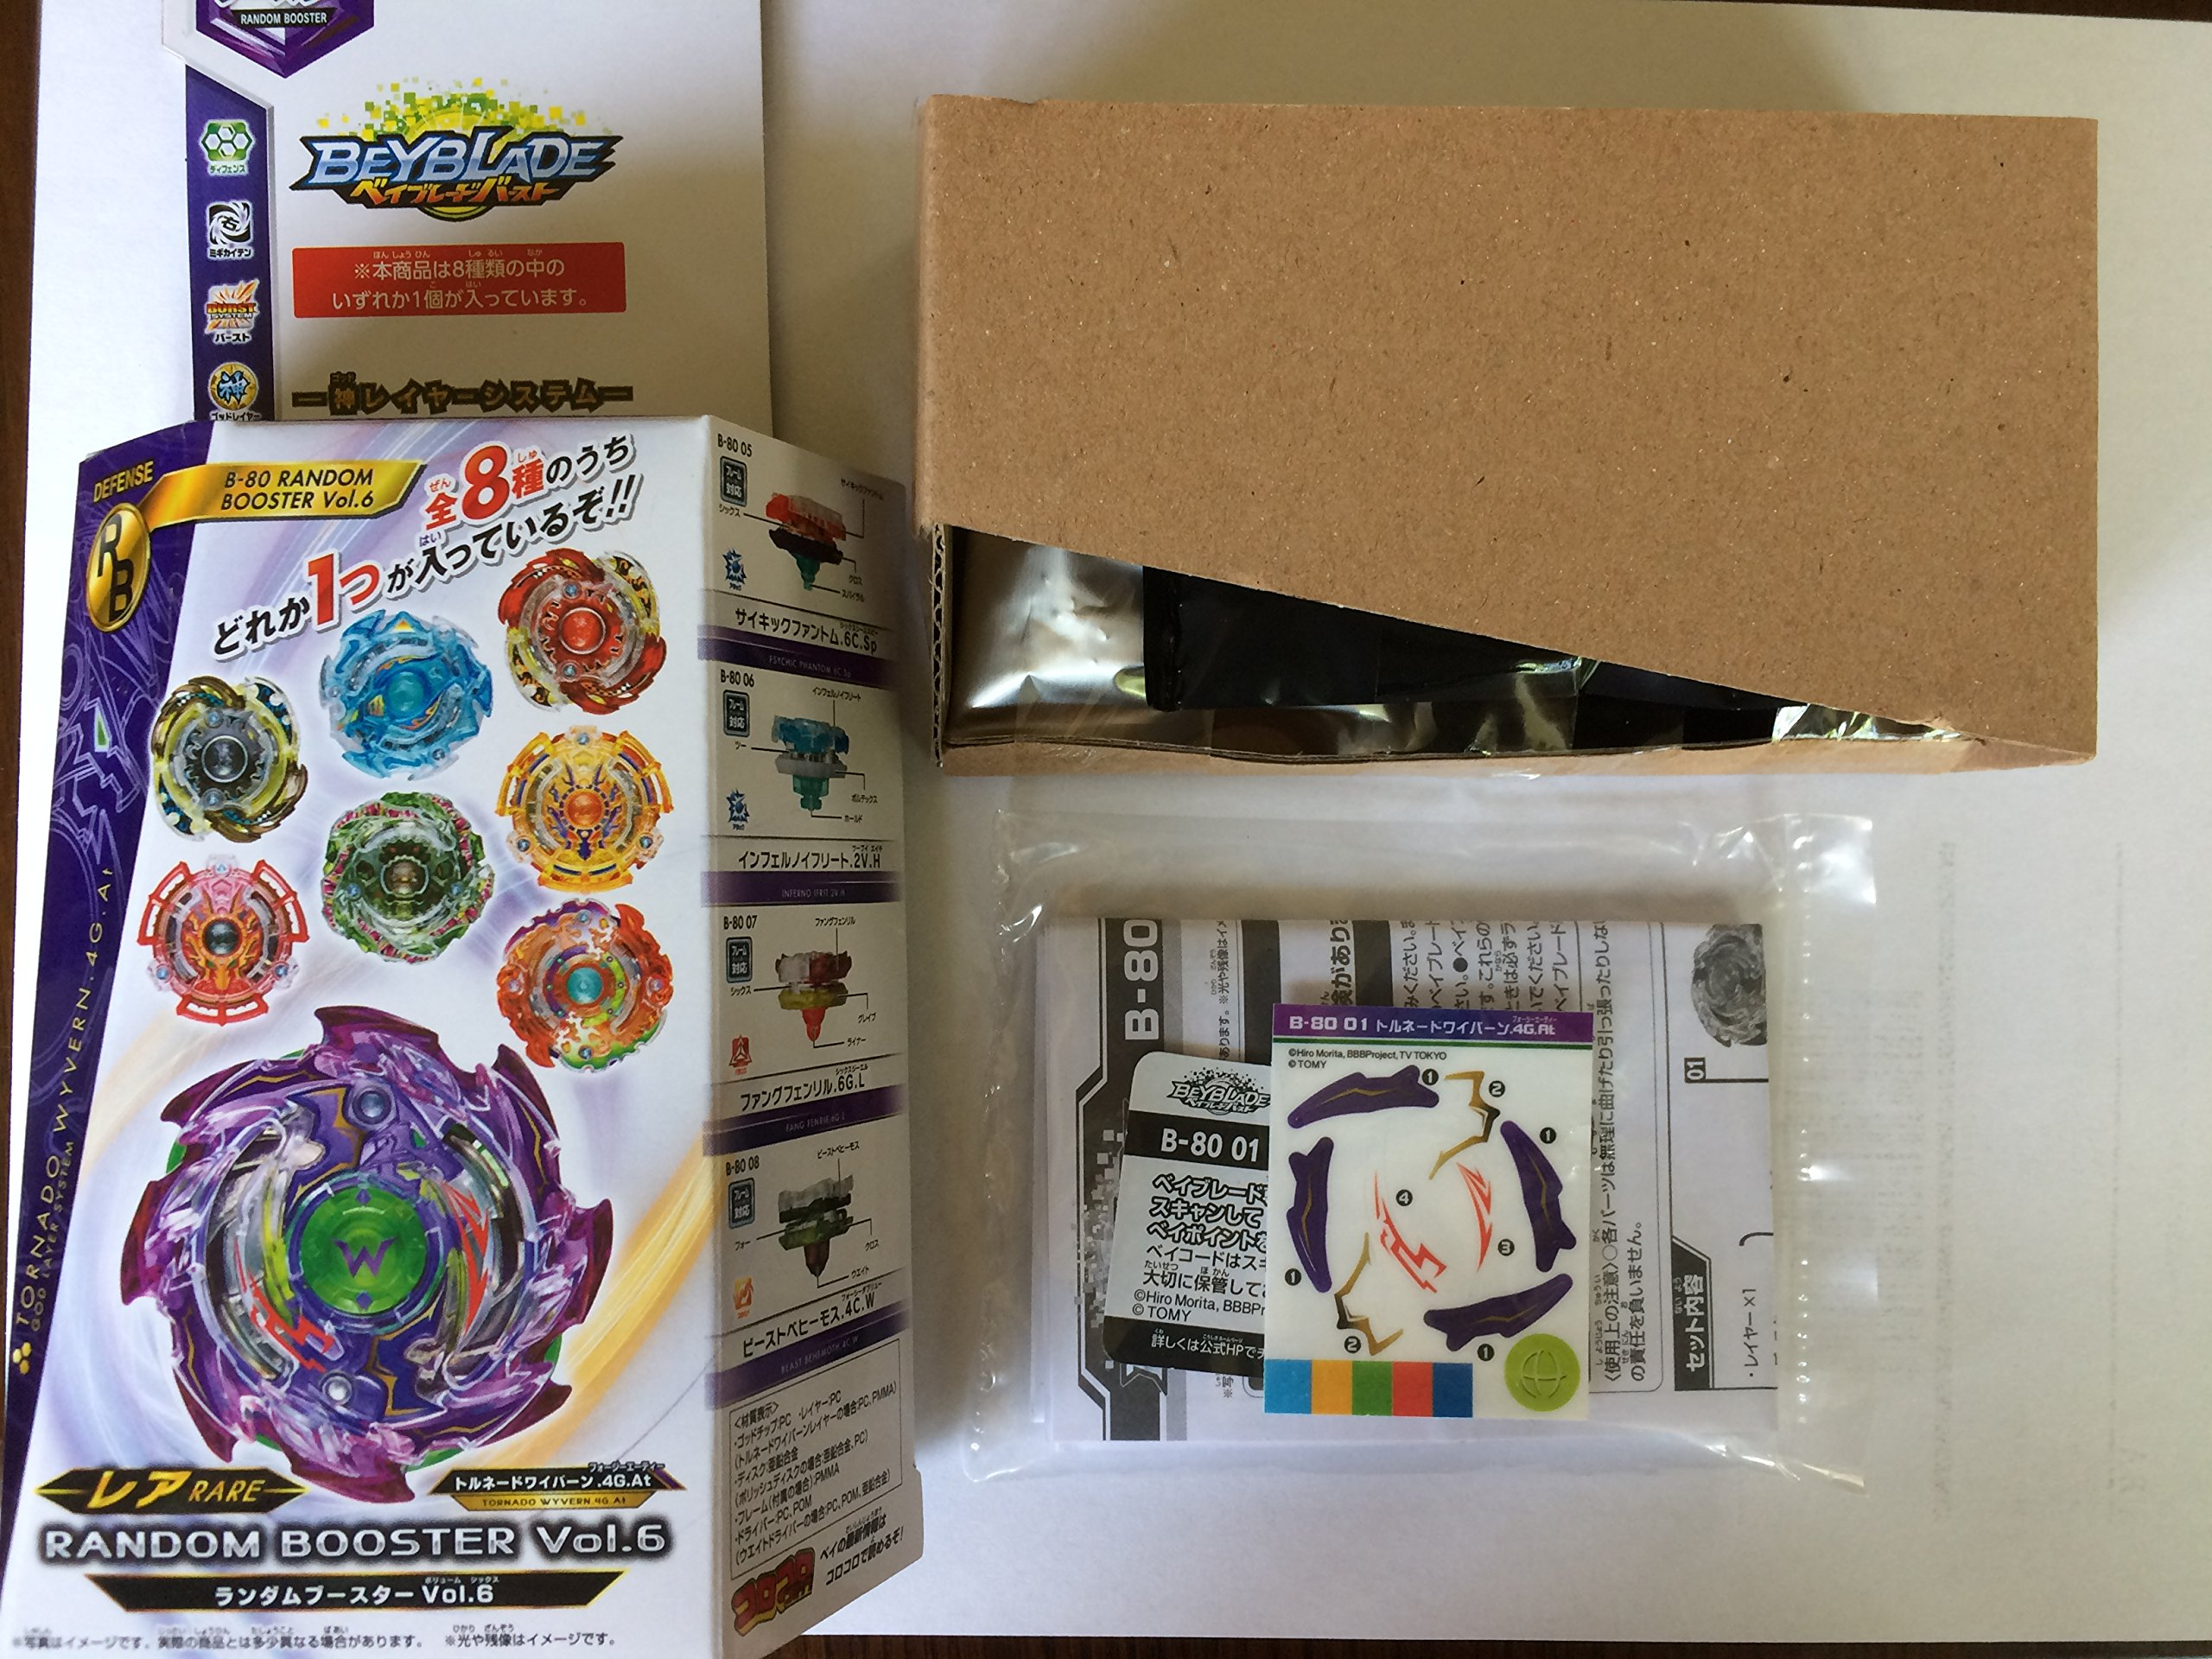 Beyblade Burst B-80 Random Booster Vol.6 01 Tornade Wyvern.4G.At by Takara Tomy